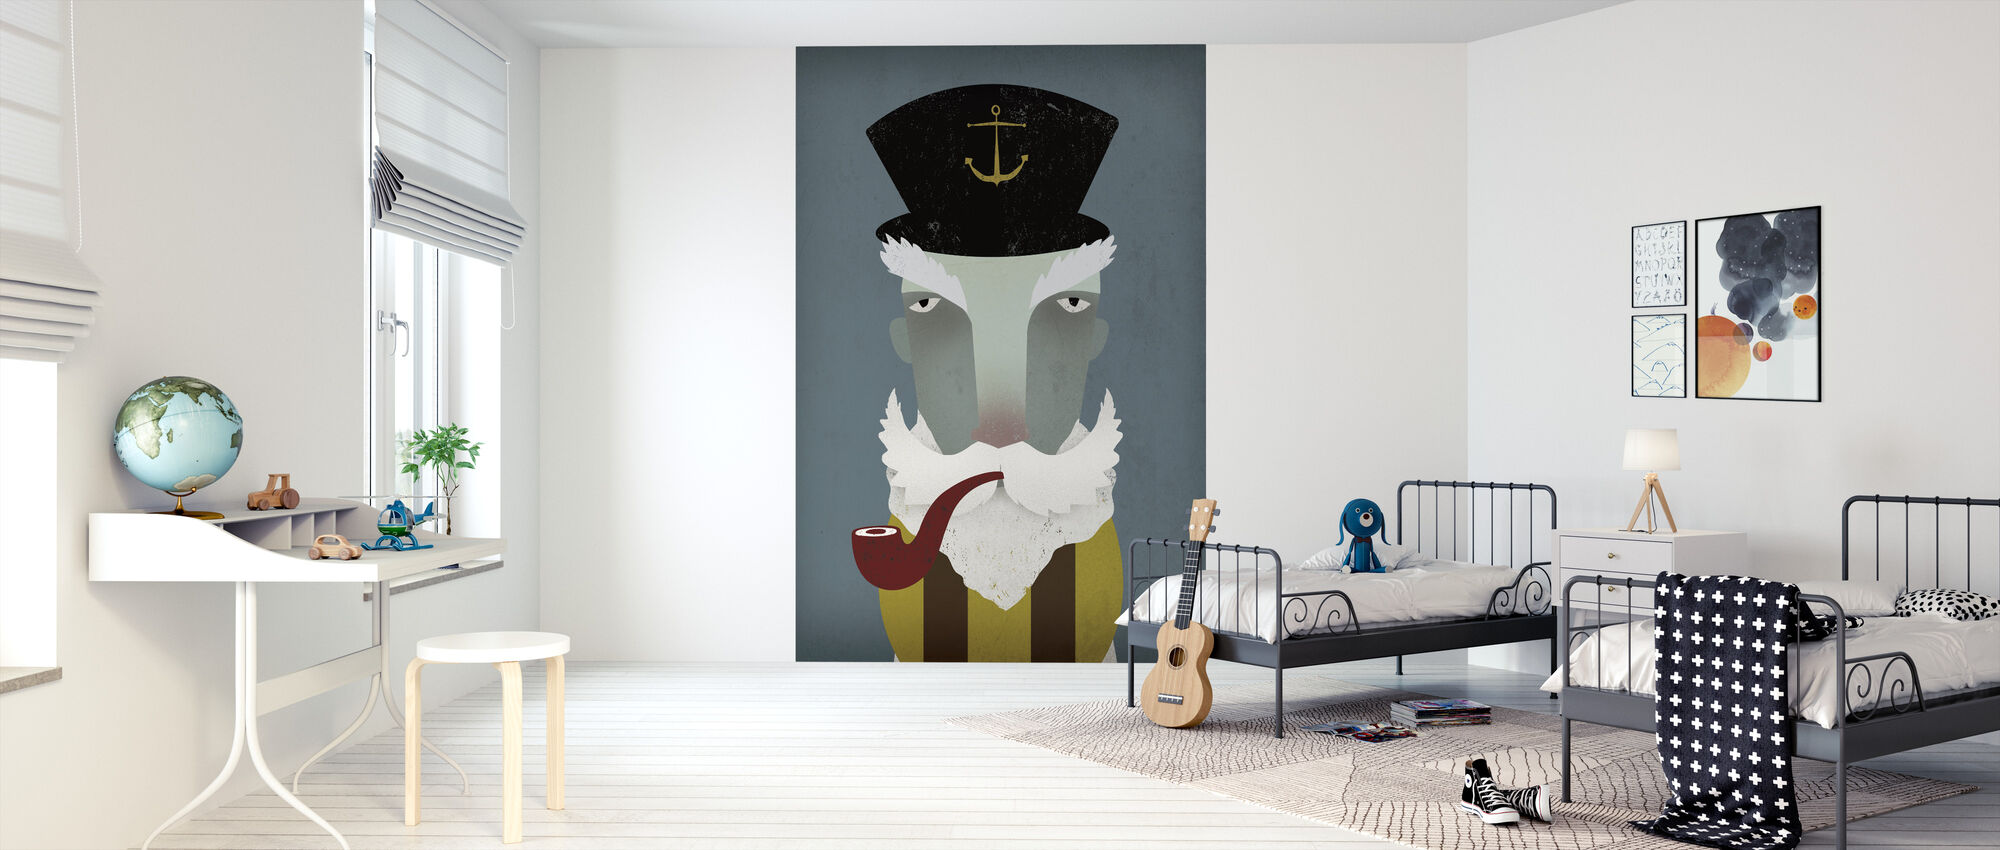 Fisherman - Wallpaper - Kids Room